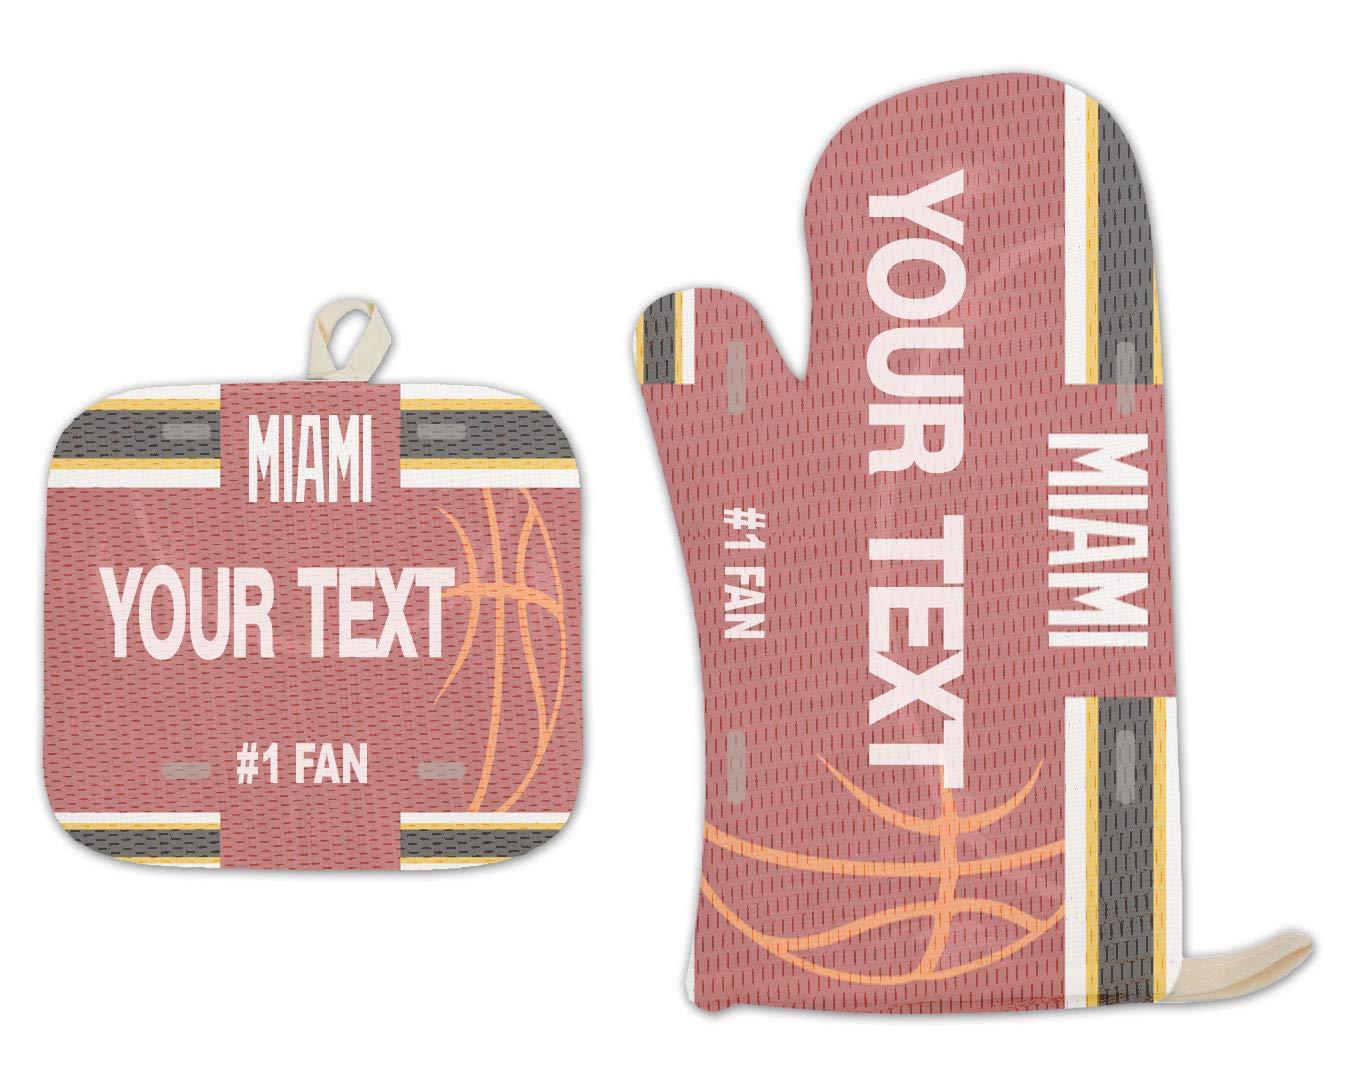 Bleu Reign BRGiftShop Personalized Custom Name Basketball Team Miami Linen Oven Mitt and Potholder Set